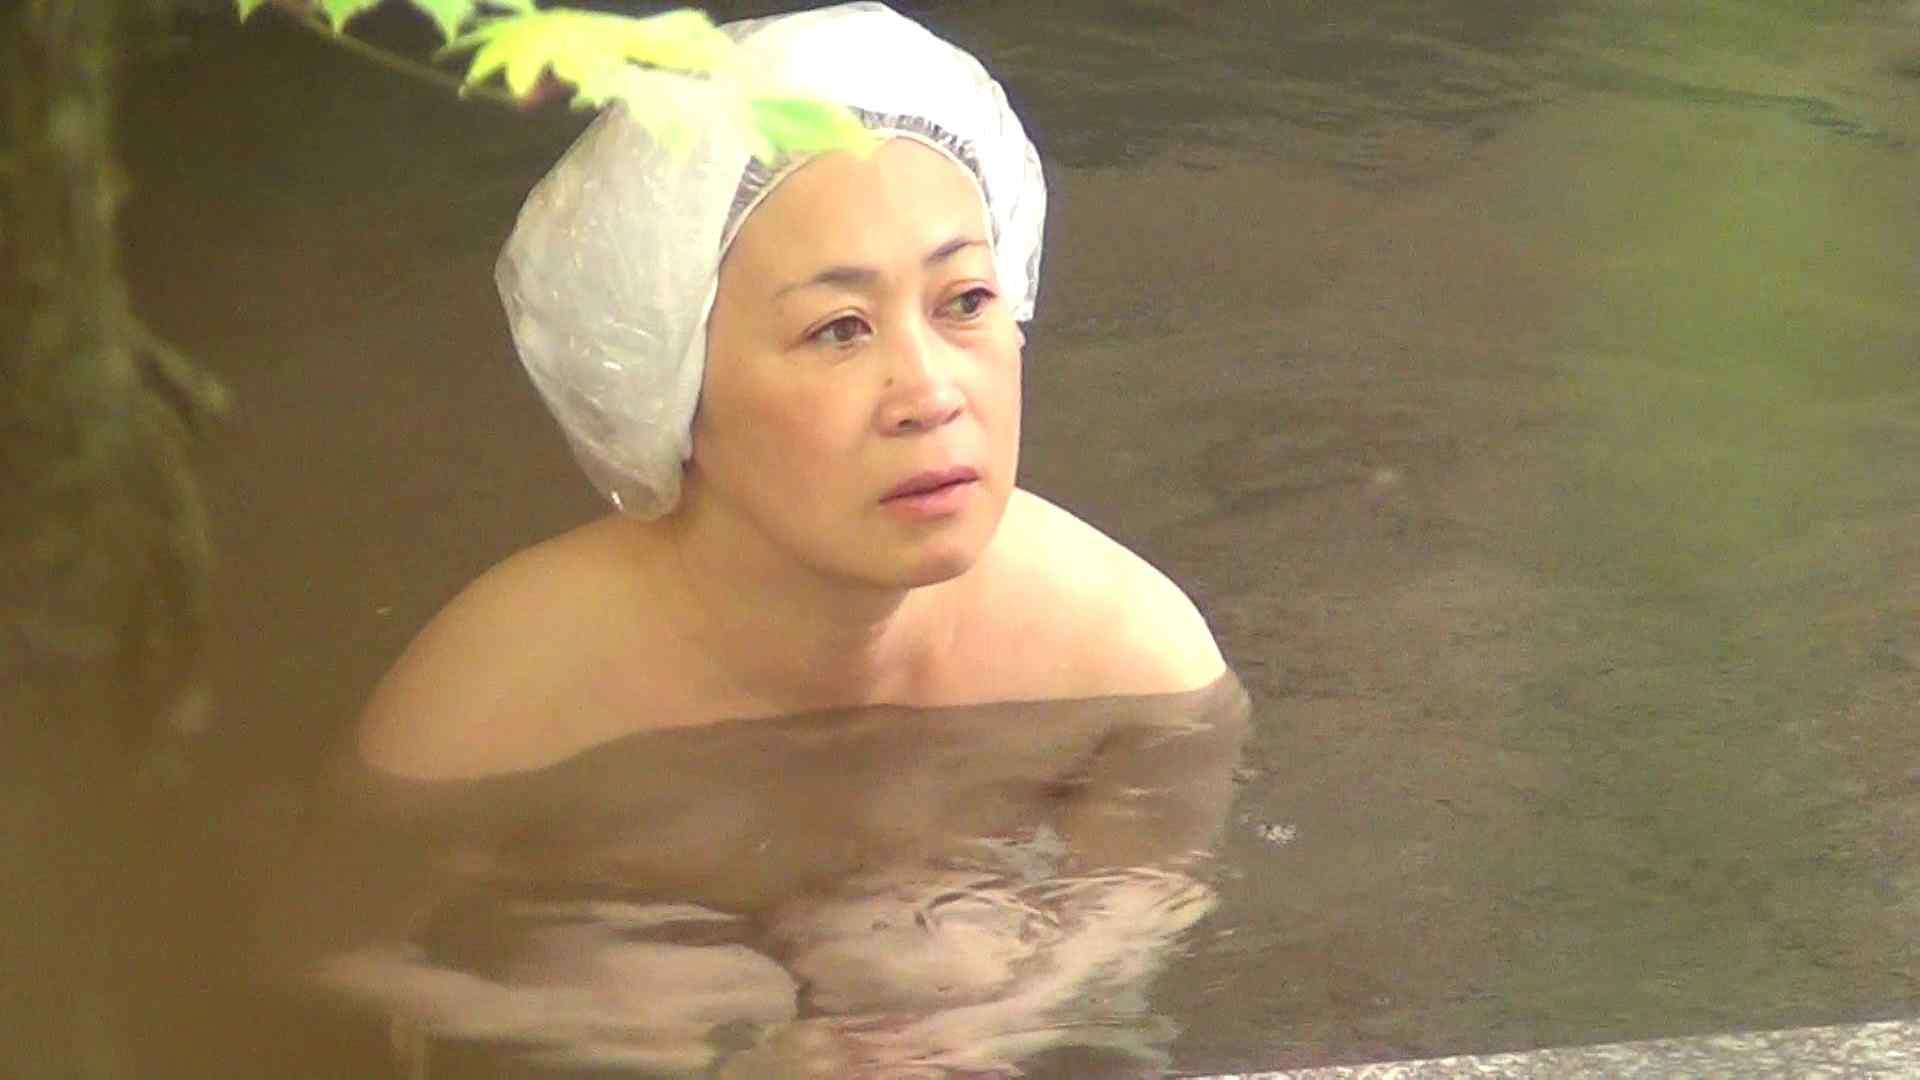 Aquaな露天風呂Vol.247 OLのエロ生活 おめこ無修正画像 83連発 59